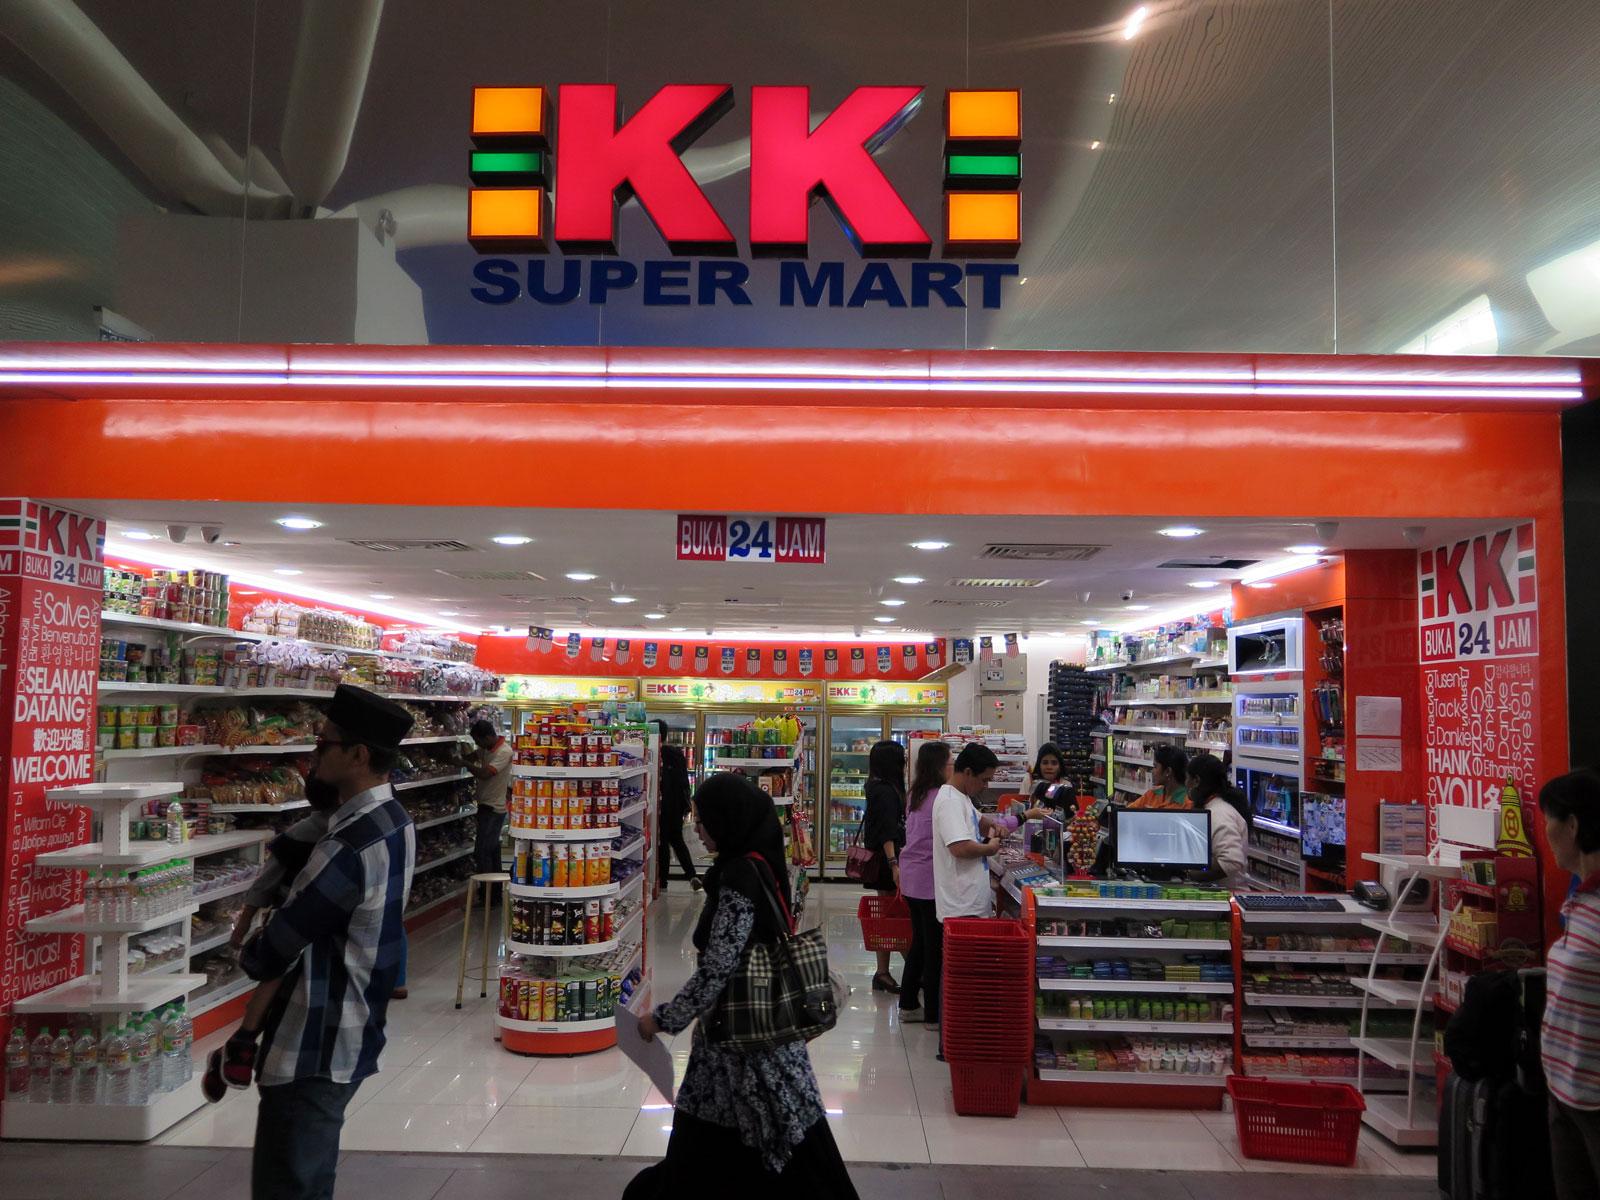 Kk Super Mart At The Klia2 Malaysia Airport Klia2 Info